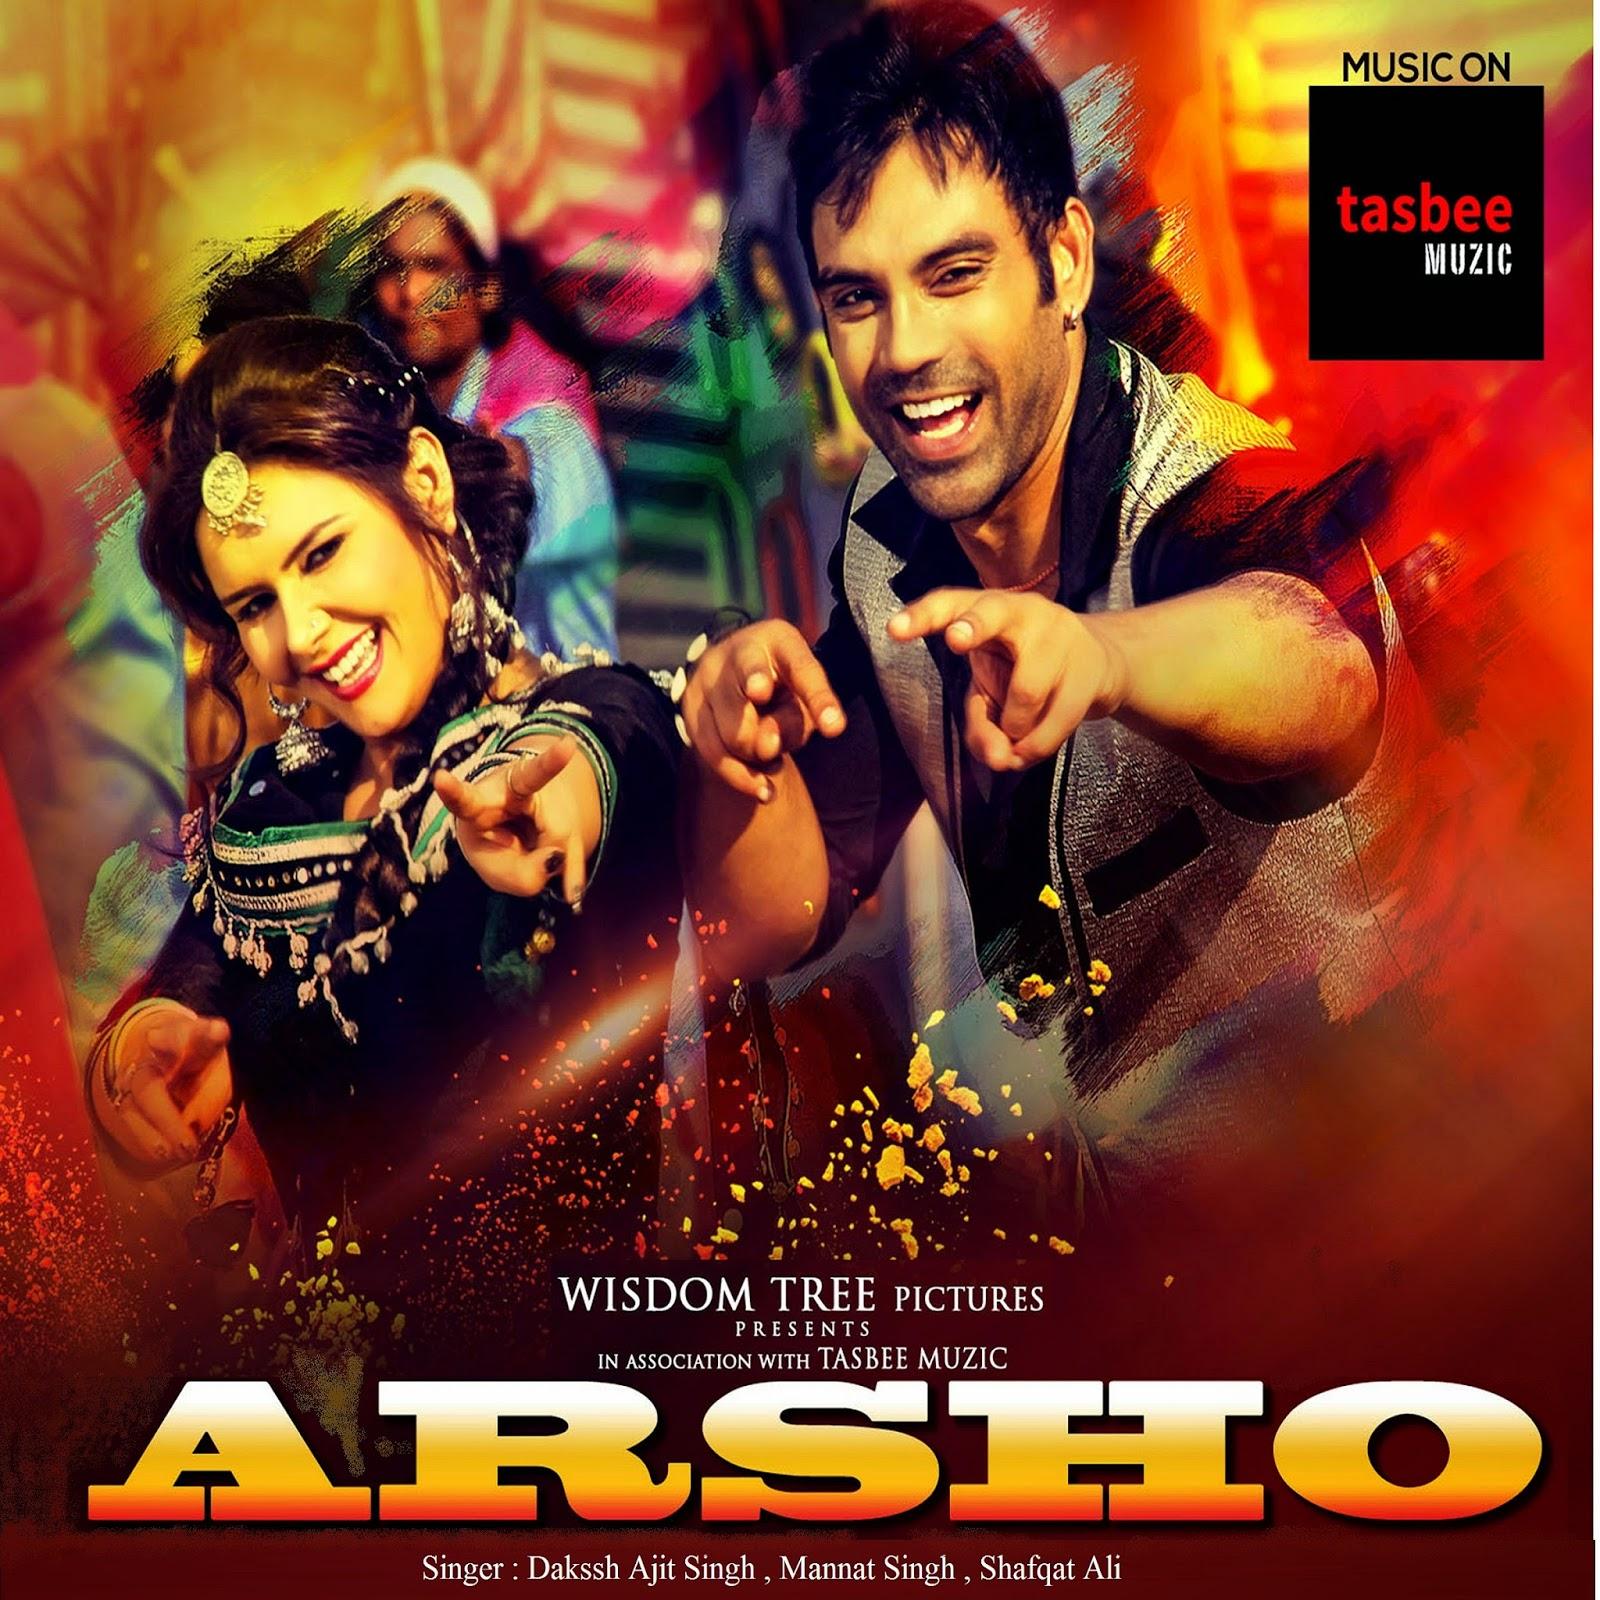 Arsho